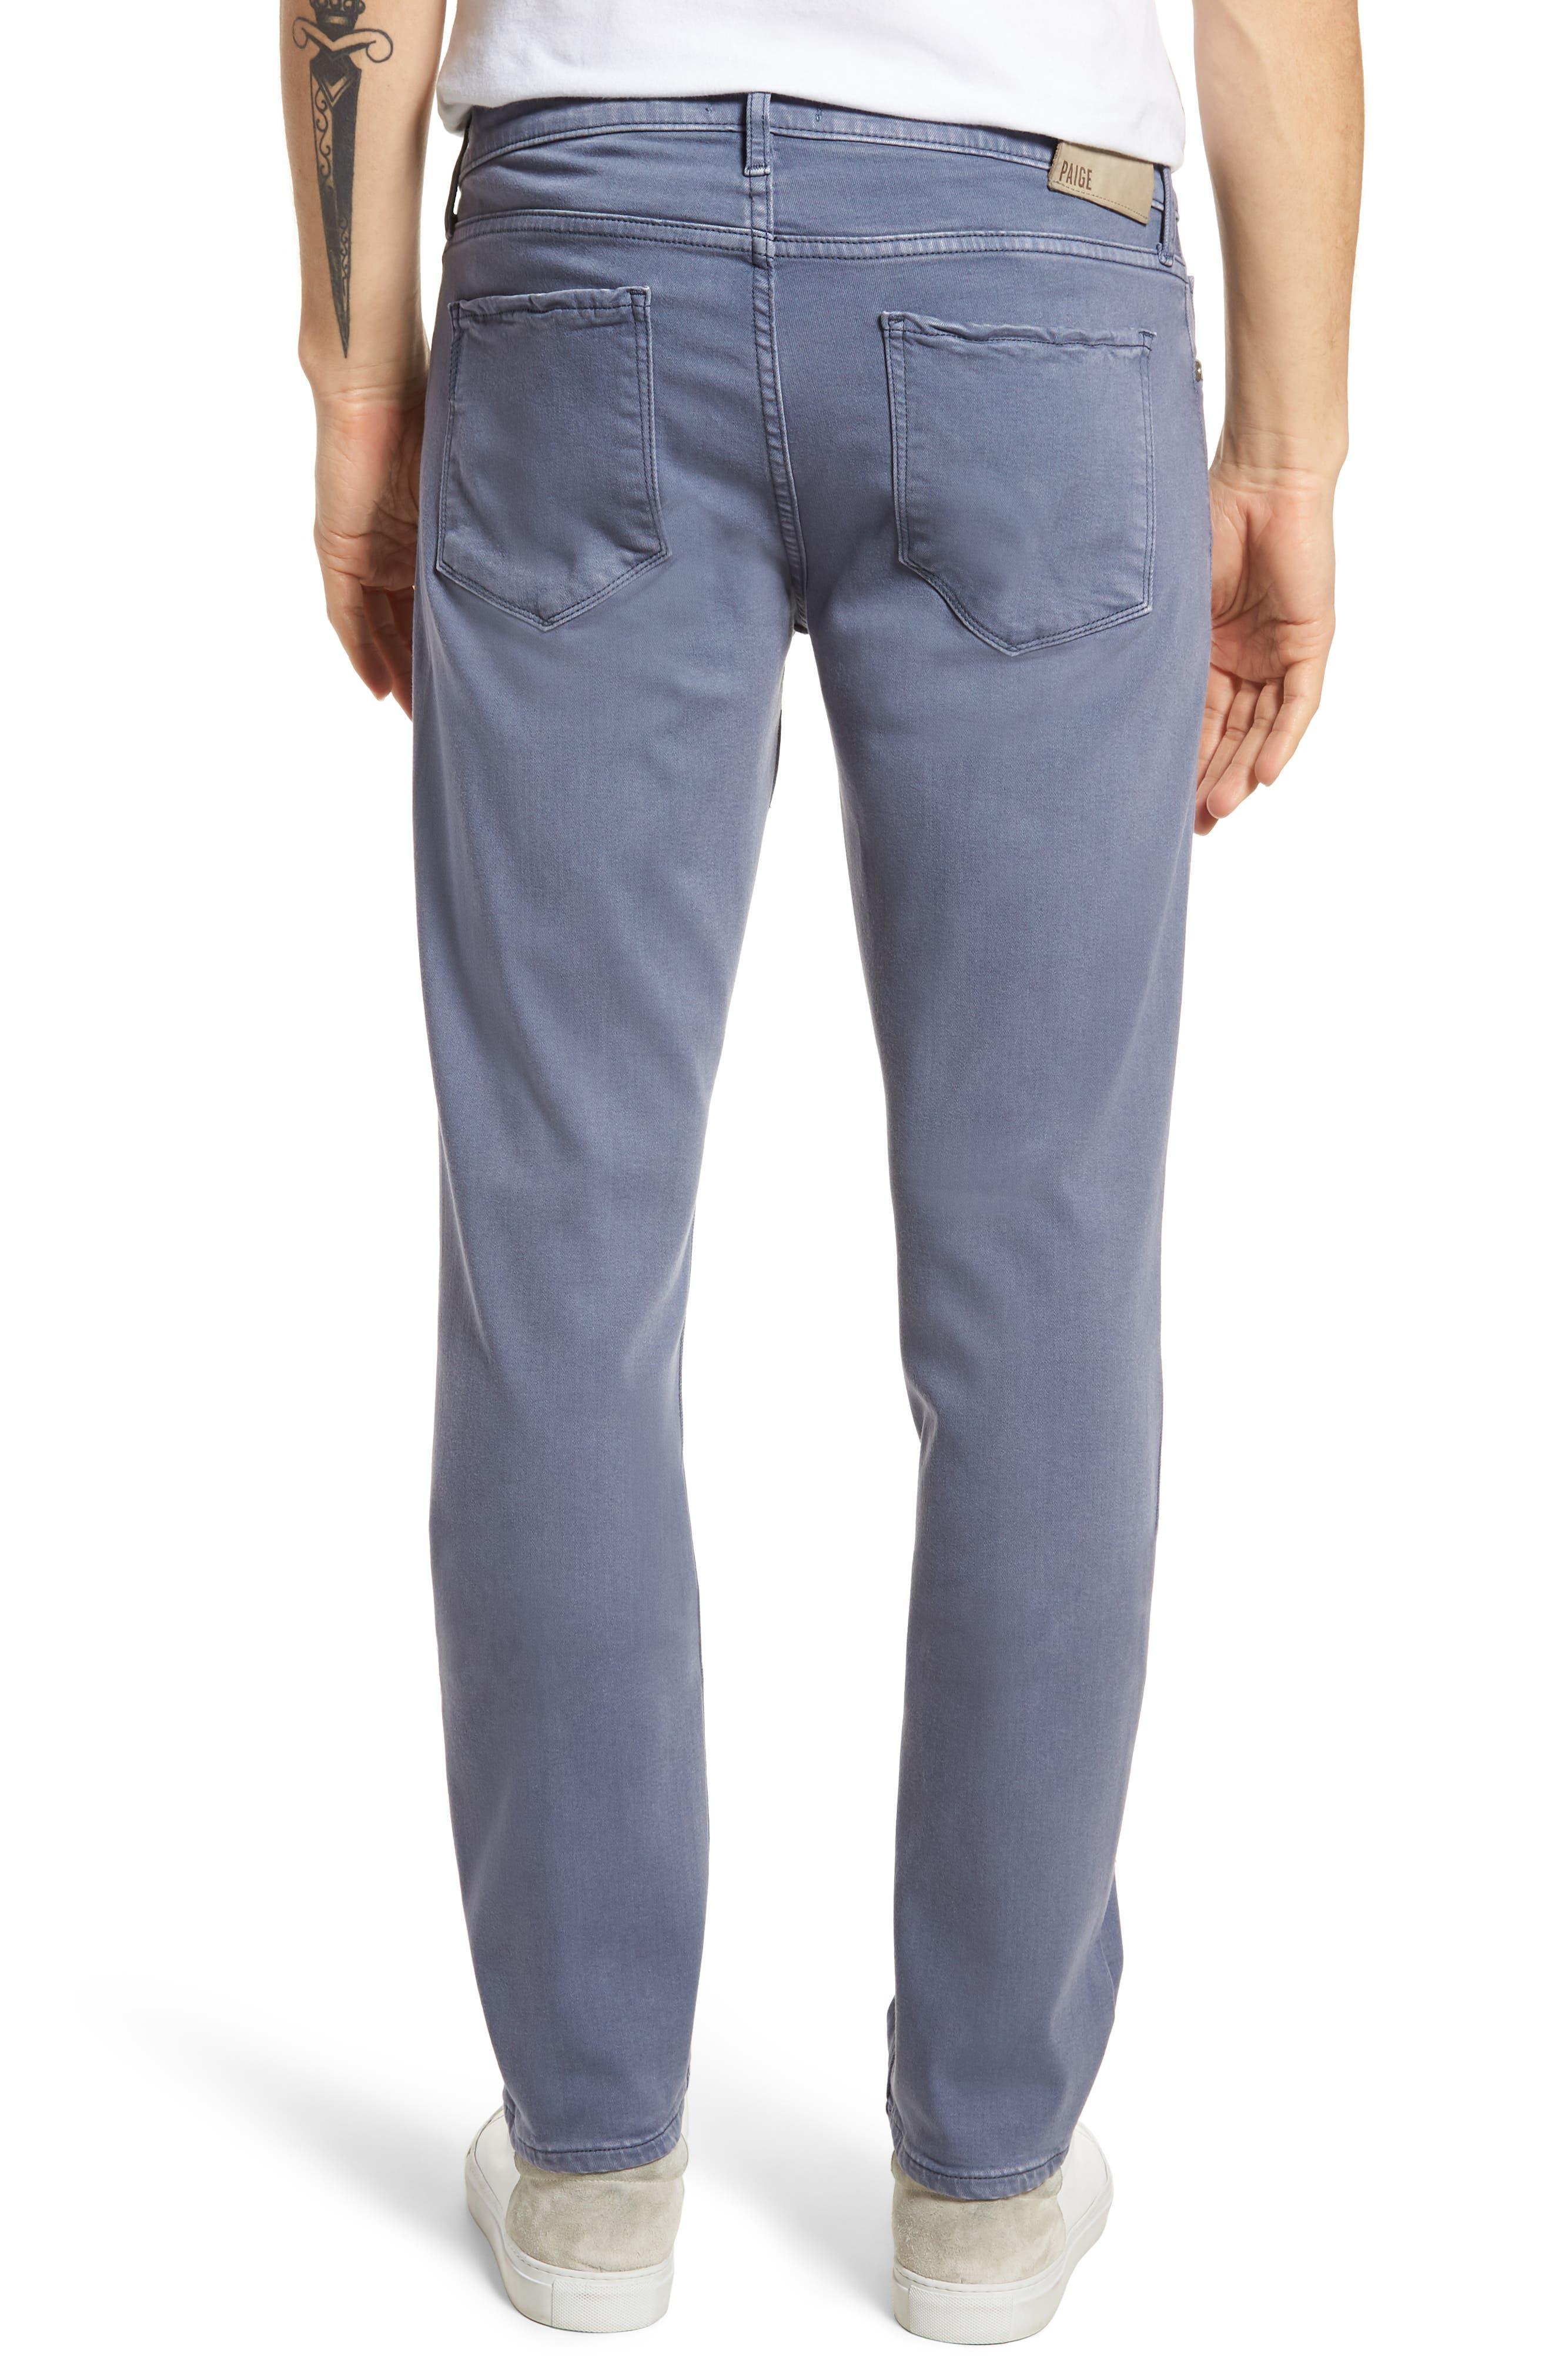 Transcend - Federal Slim Straight Leg Jeans,                             Alternate thumbnail 2, color,                             420